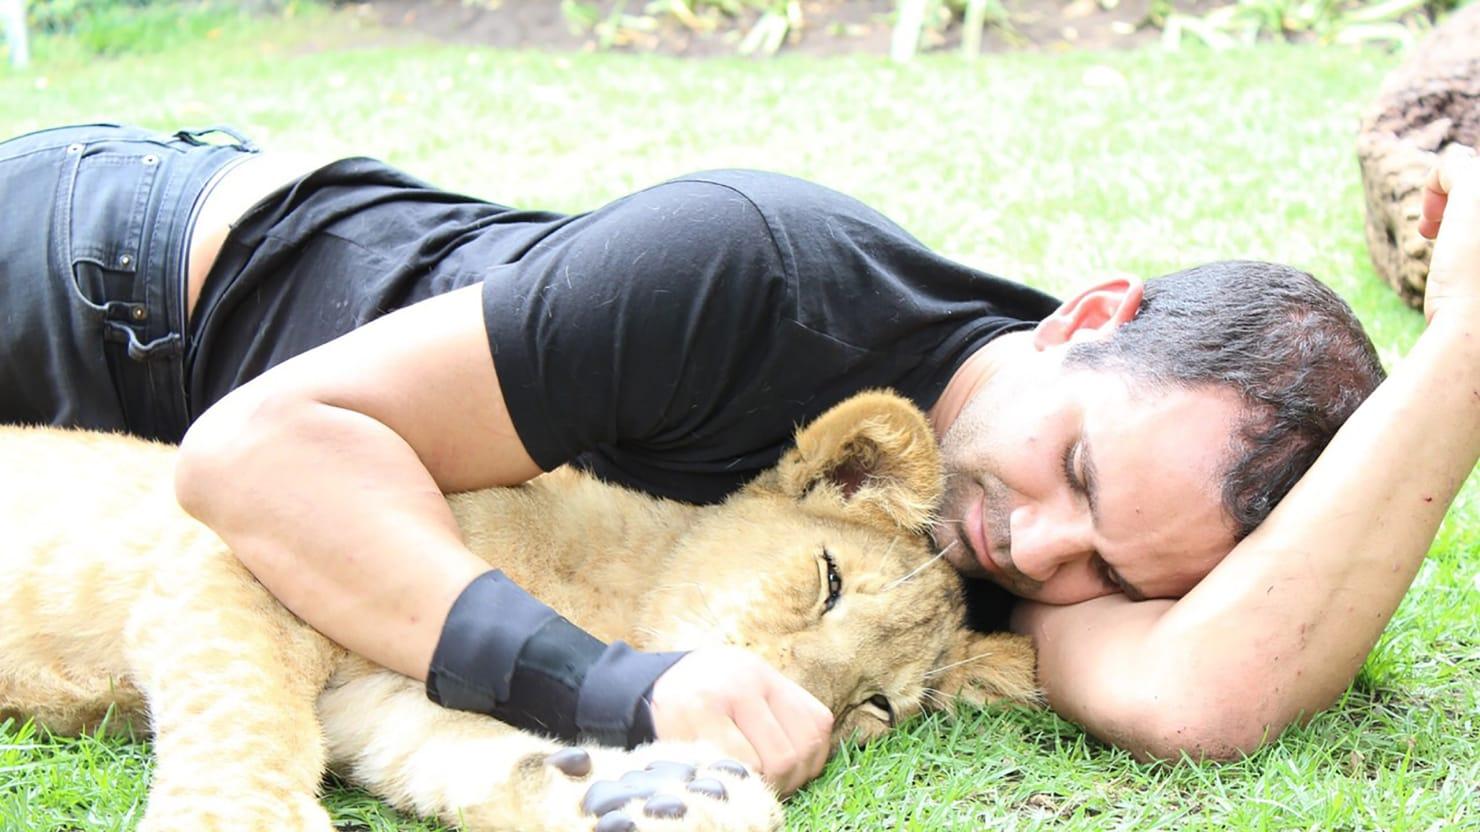 hollywood s favorite sham petting zoo